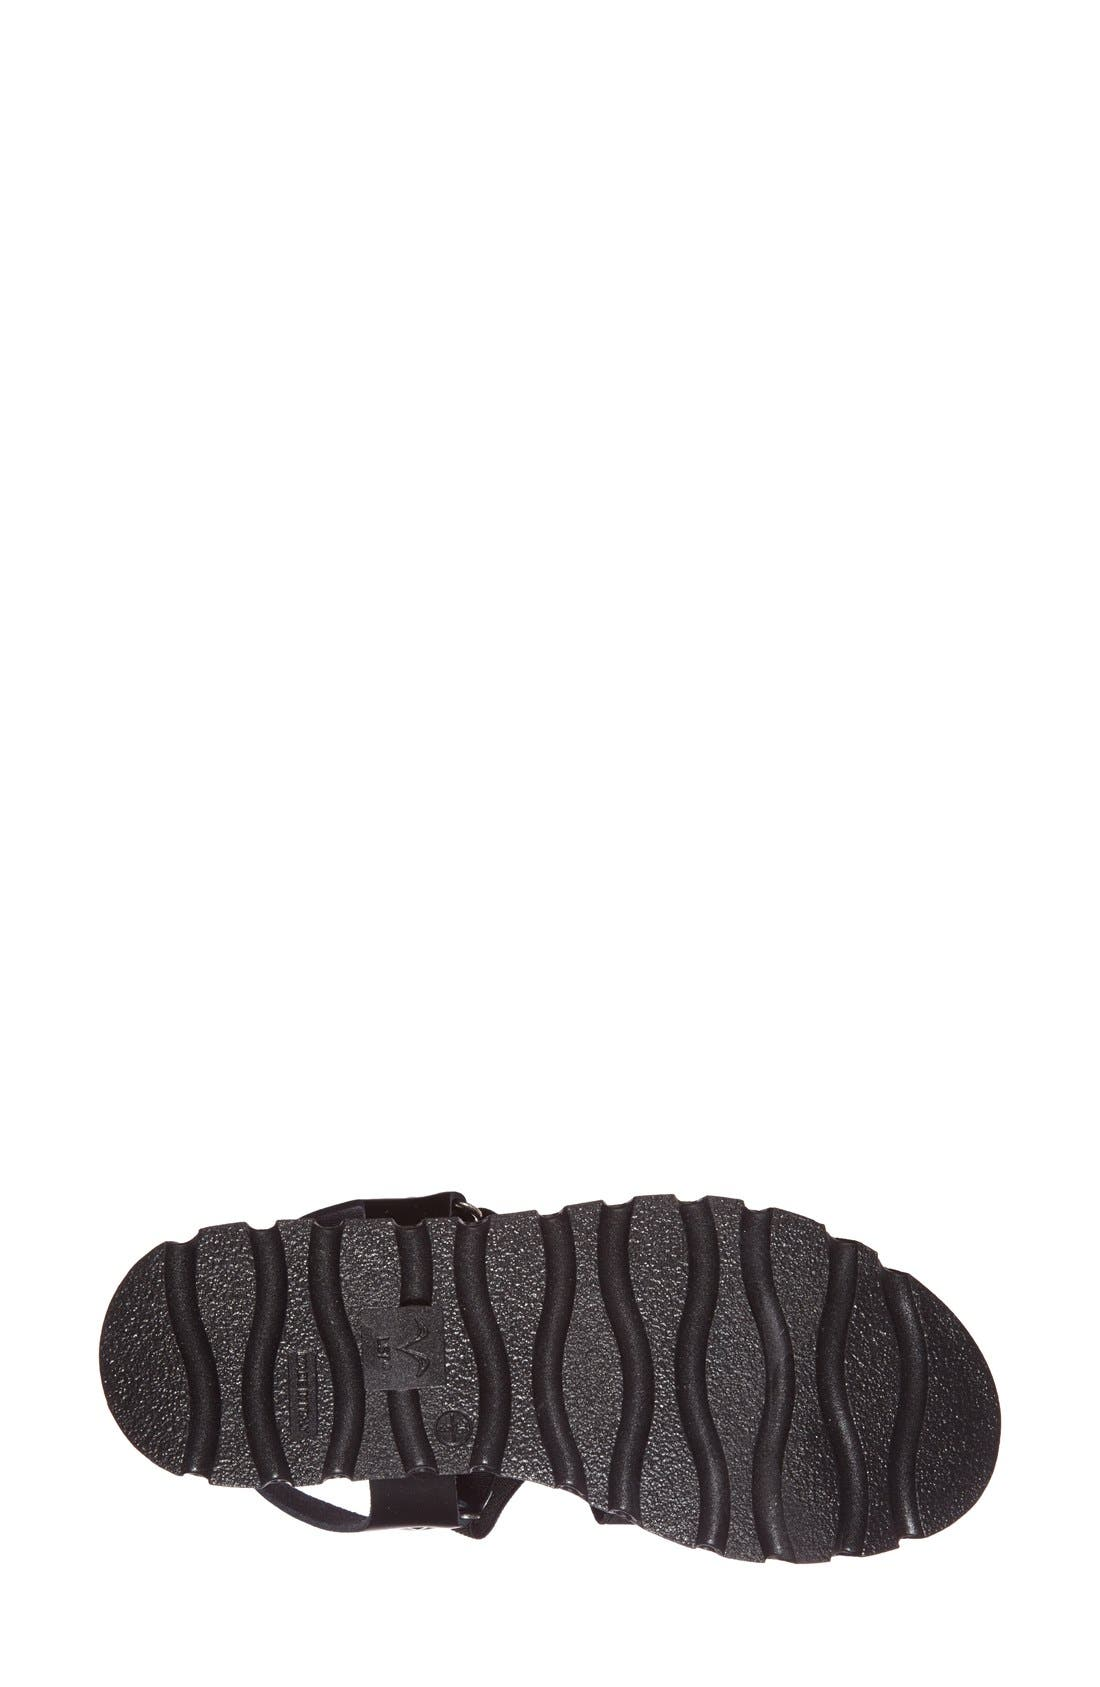 Alternate Image 4  - Topshop 'Folly' Strappy Platform Sandal (Women)